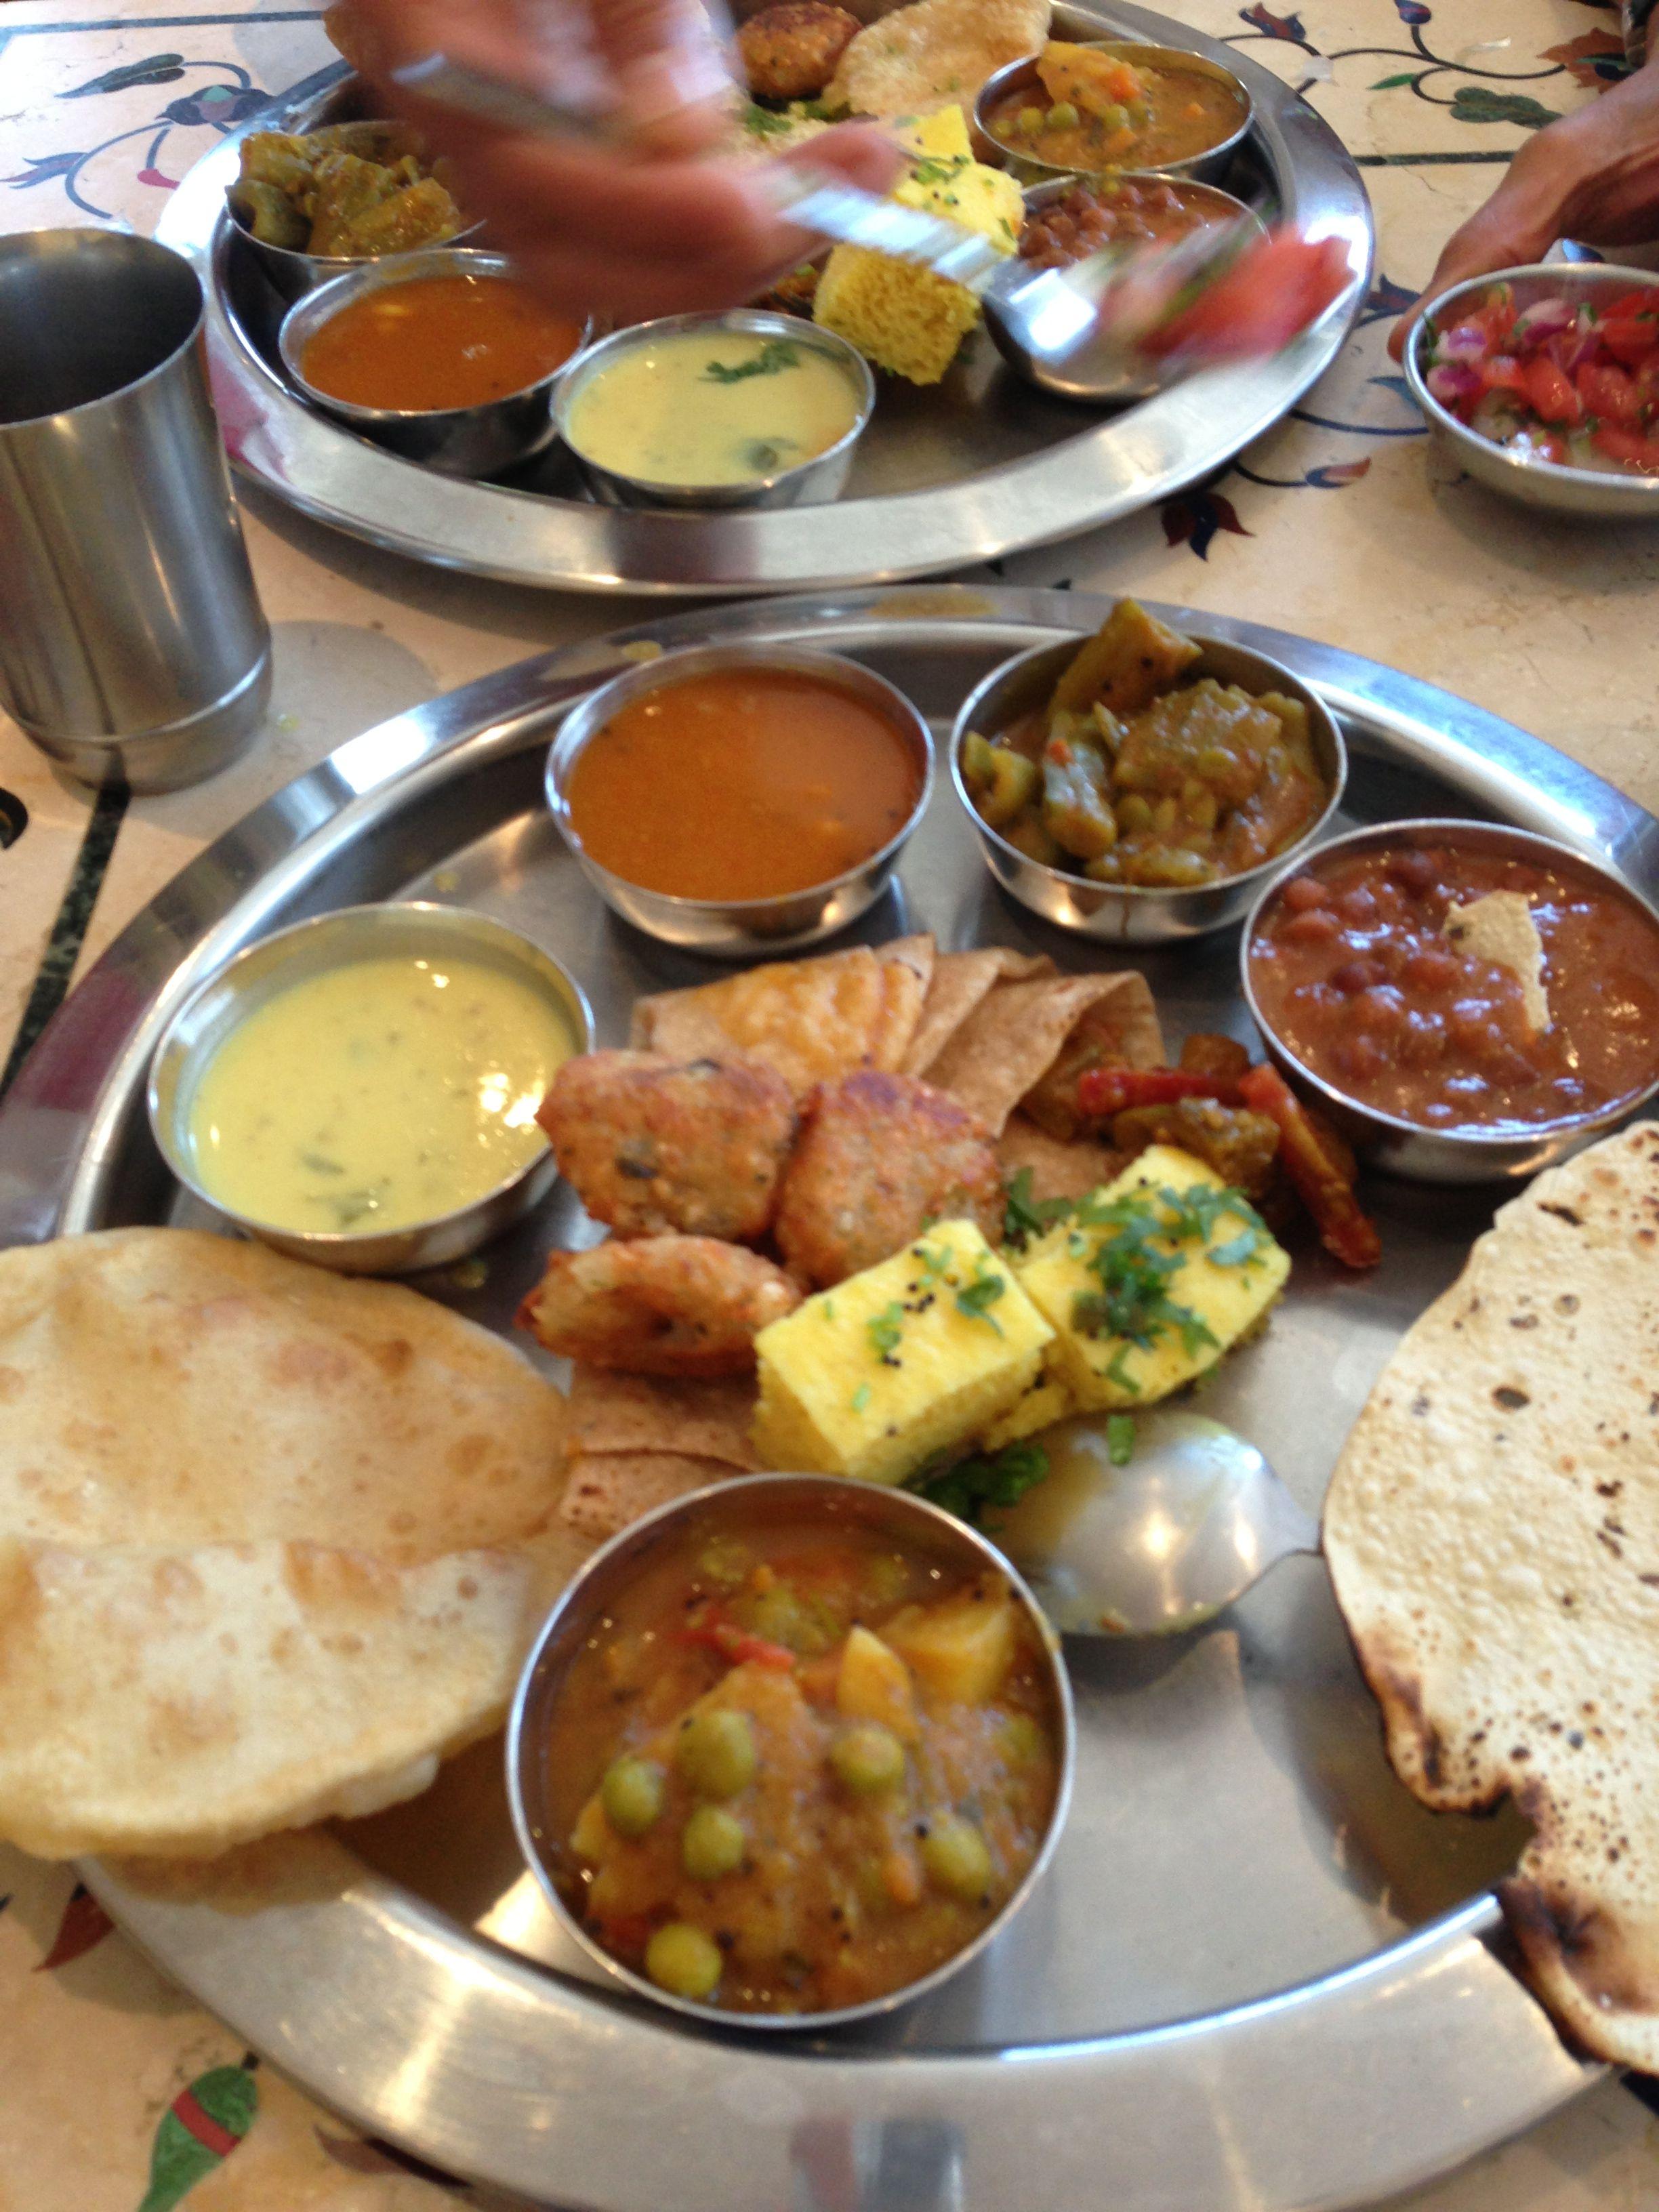 Vegetarian indian food is healthy and tasty nutrition vegetarian indian food is healthy and tasty forumfinder Gallery